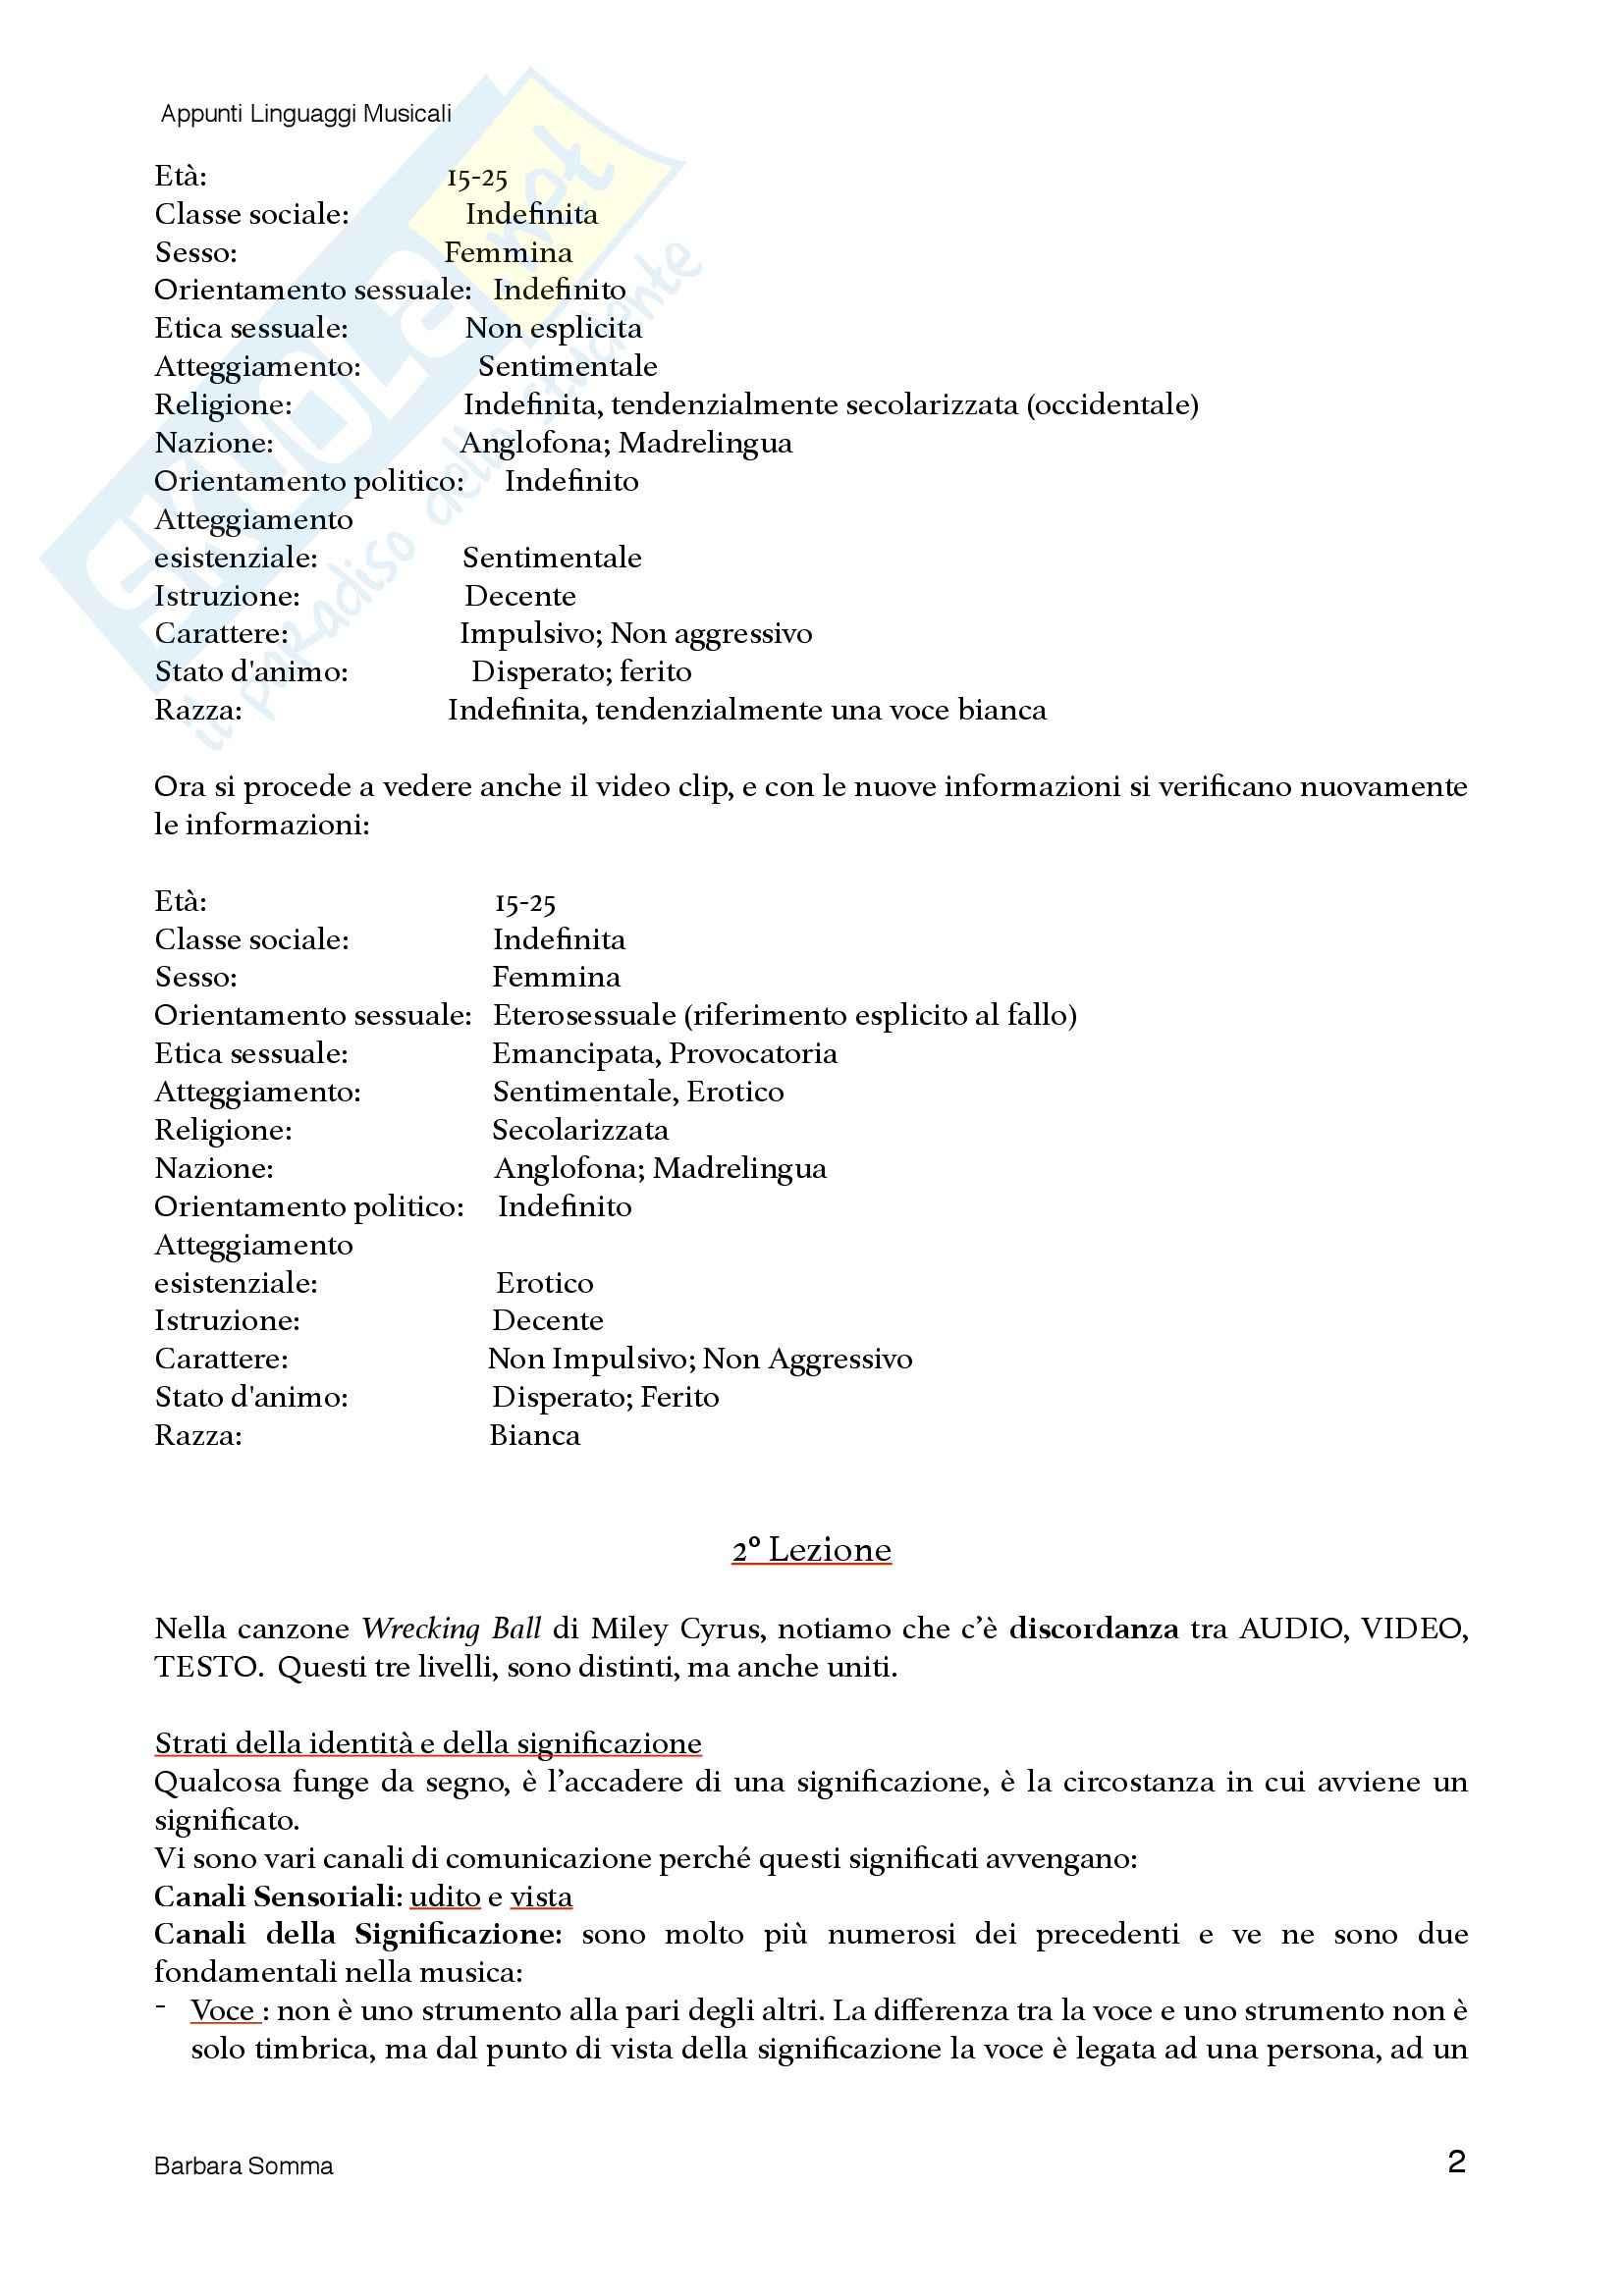 Linguaggi Musicali - nozioni Pag. 2